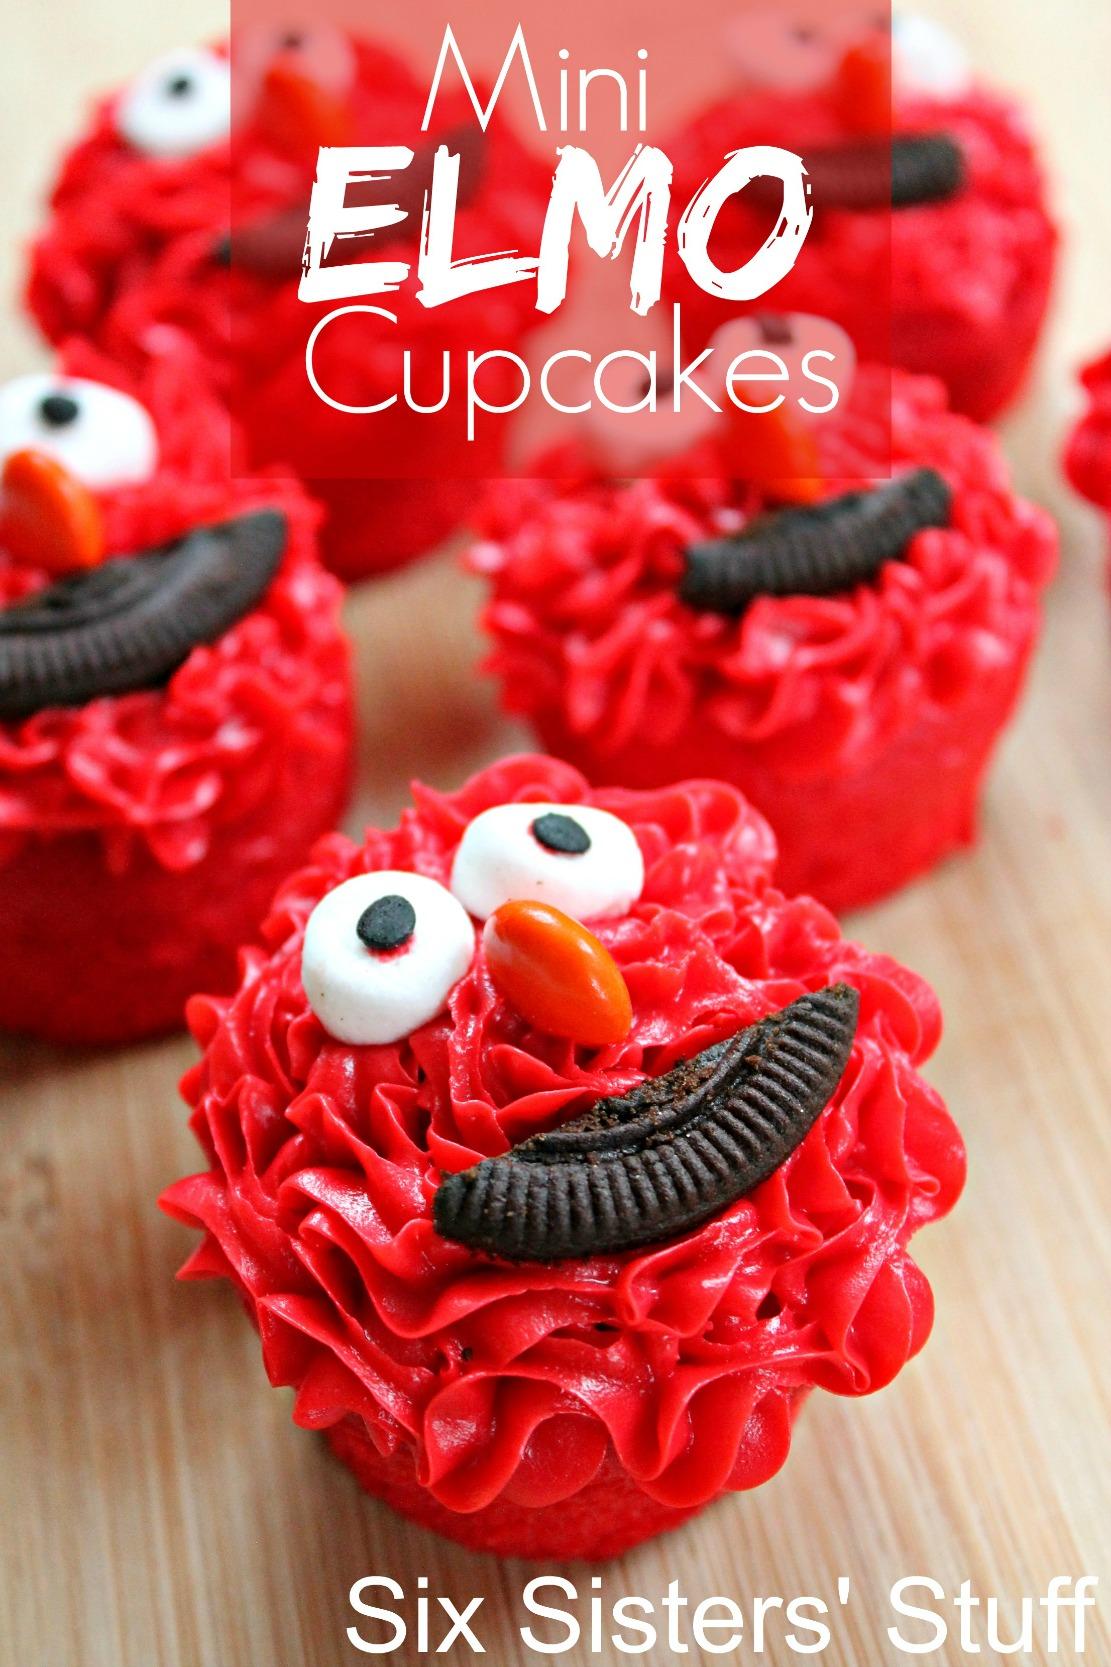 Mini Elmo Cupcakes 1